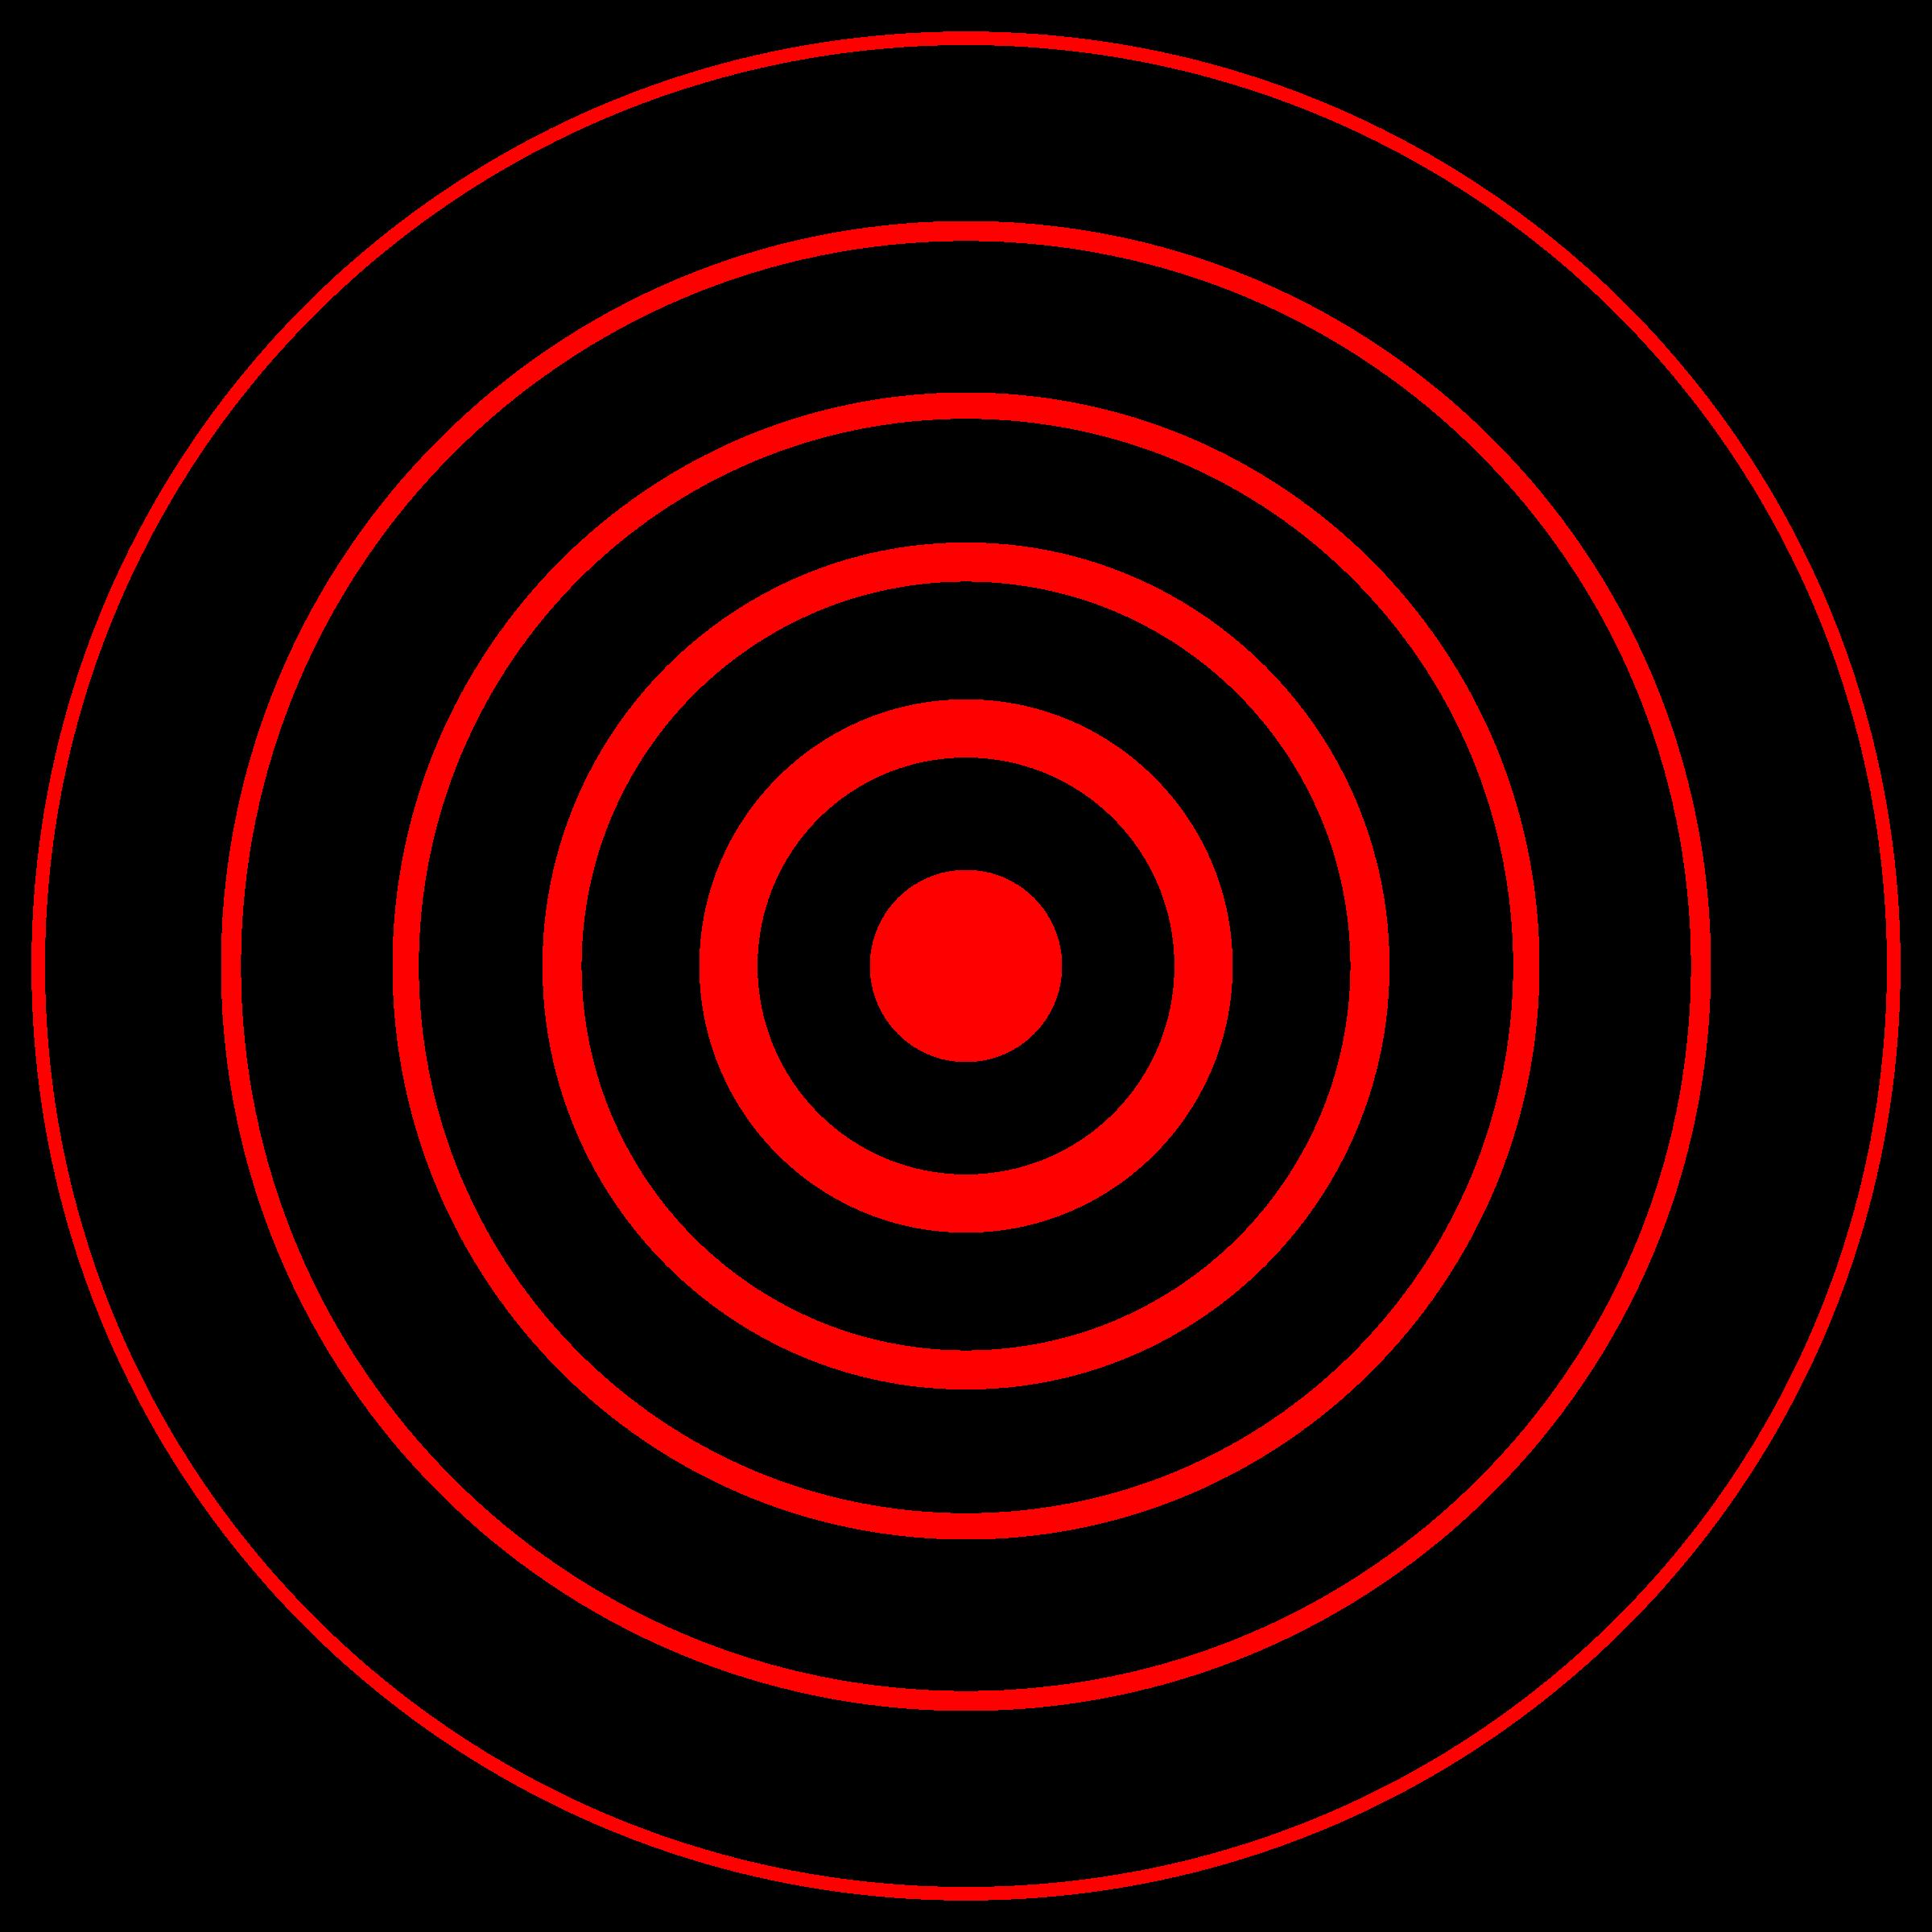 Earthquake clipart epicenter. Map symbol sign big